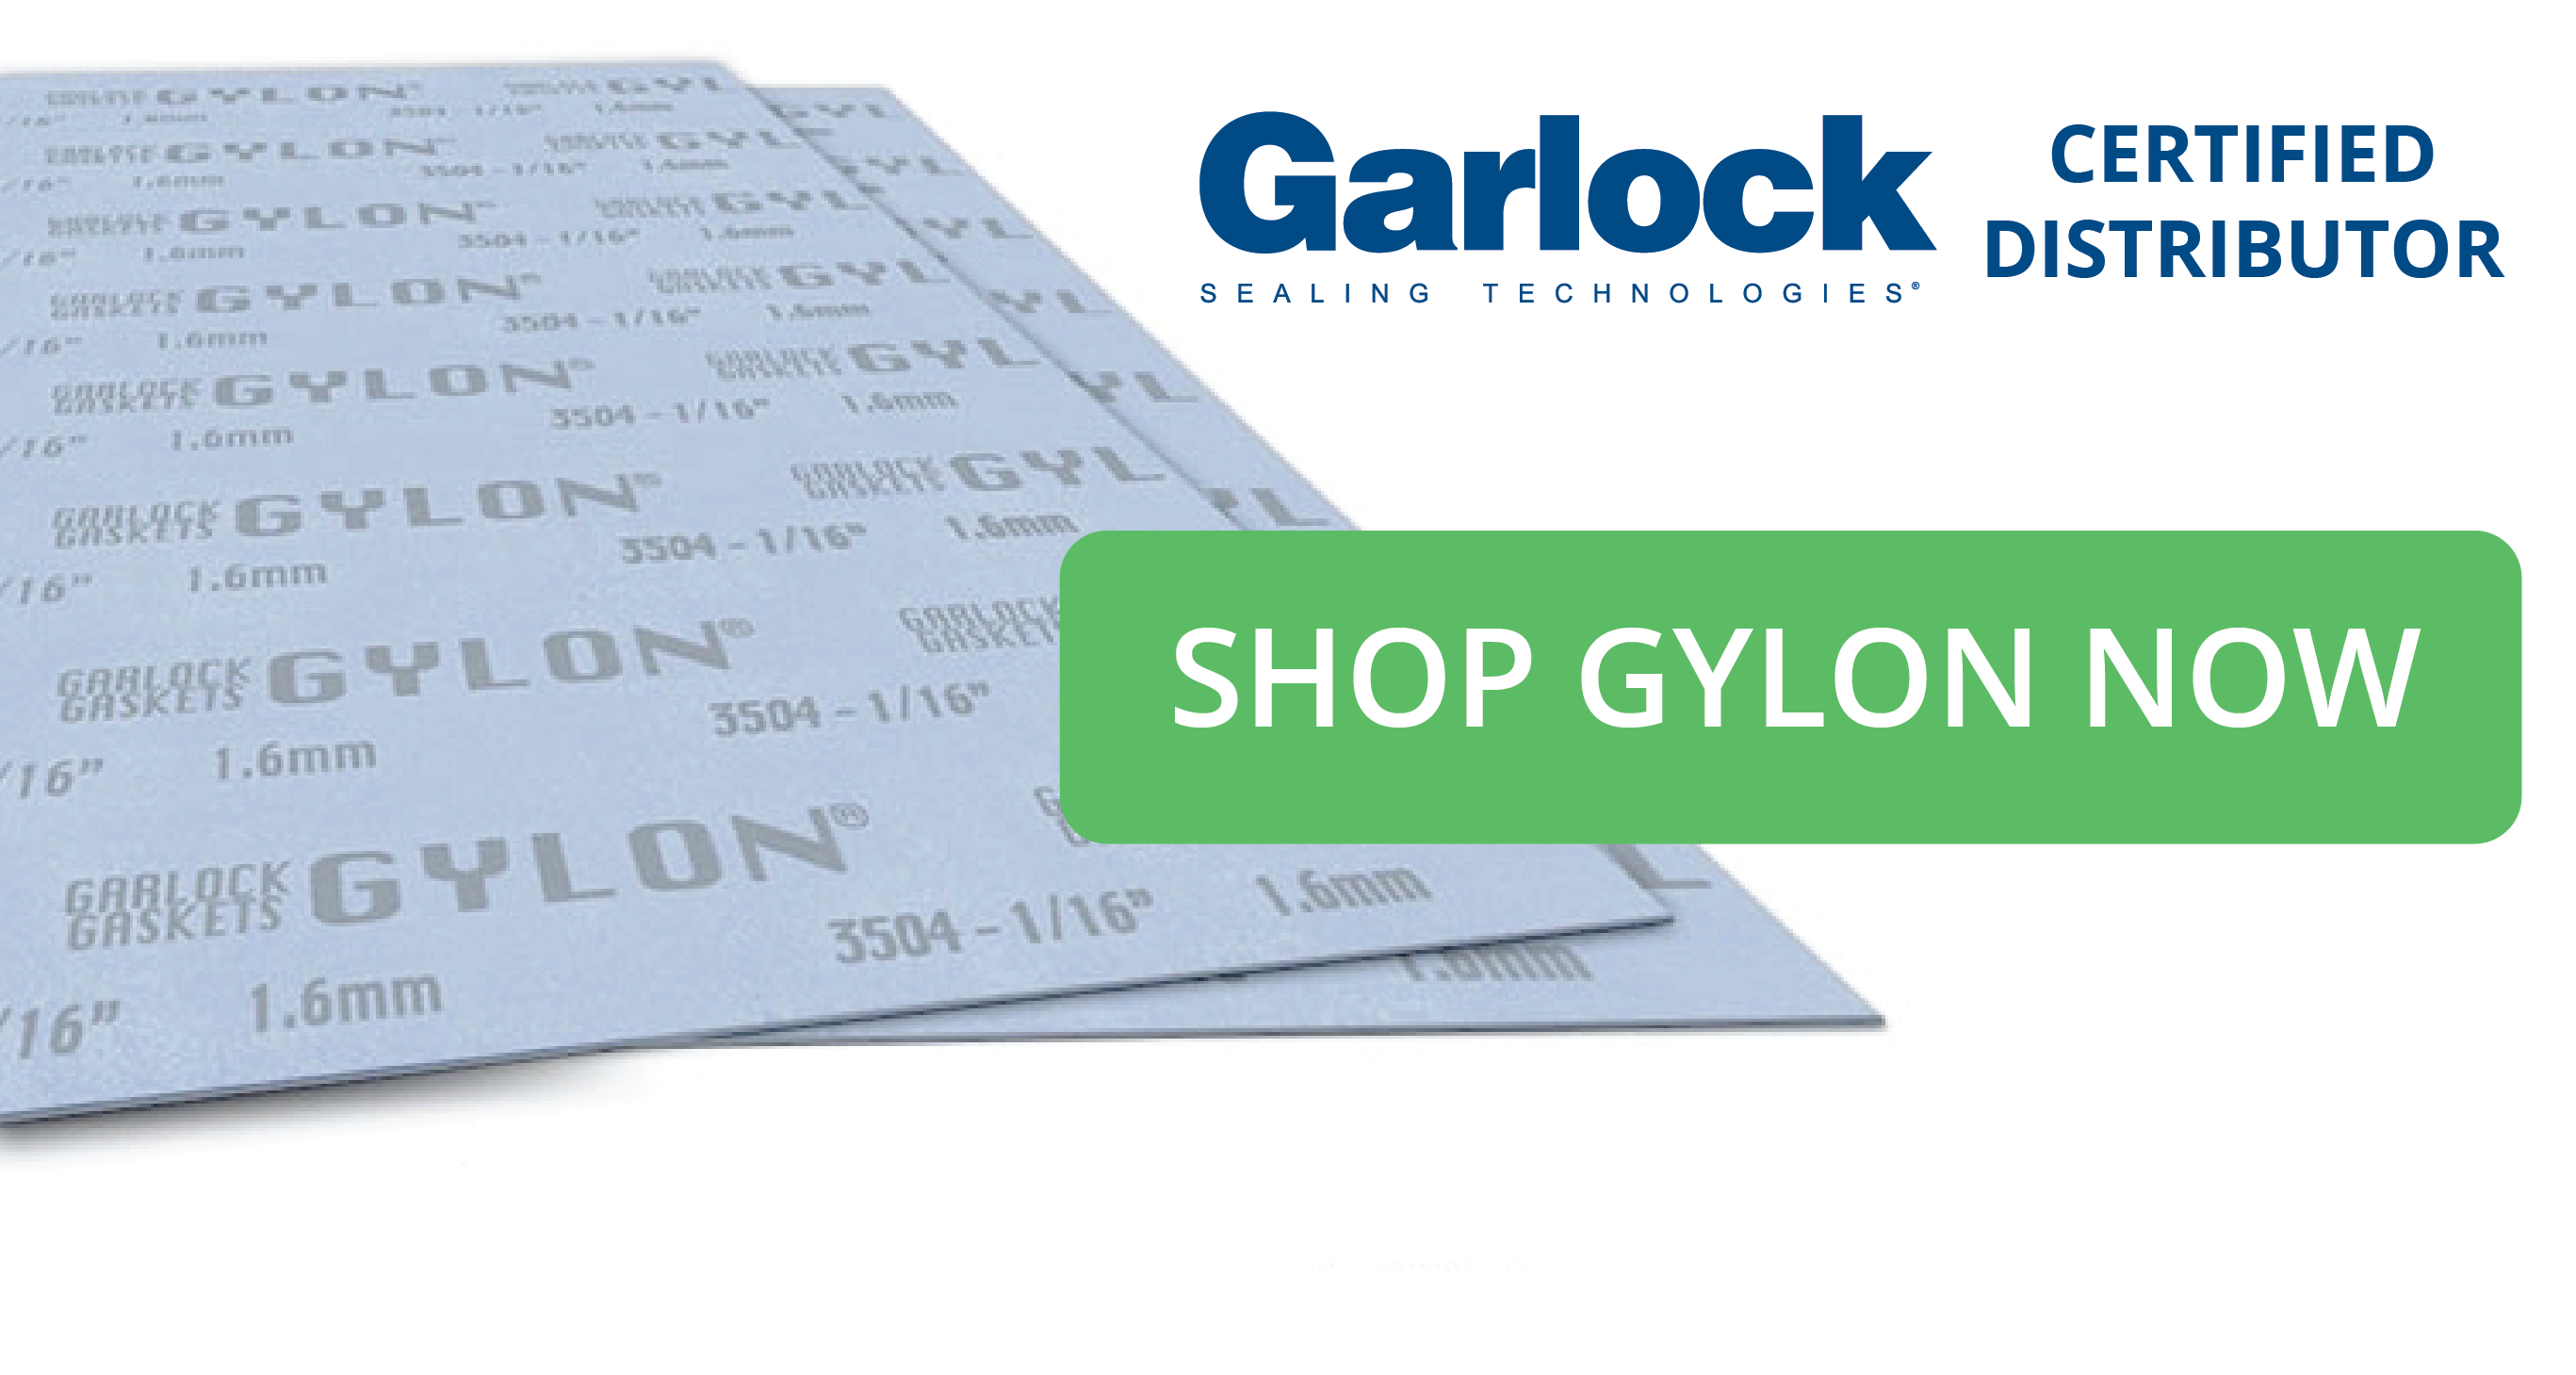 SHOP GARLOCK GYLON NOW